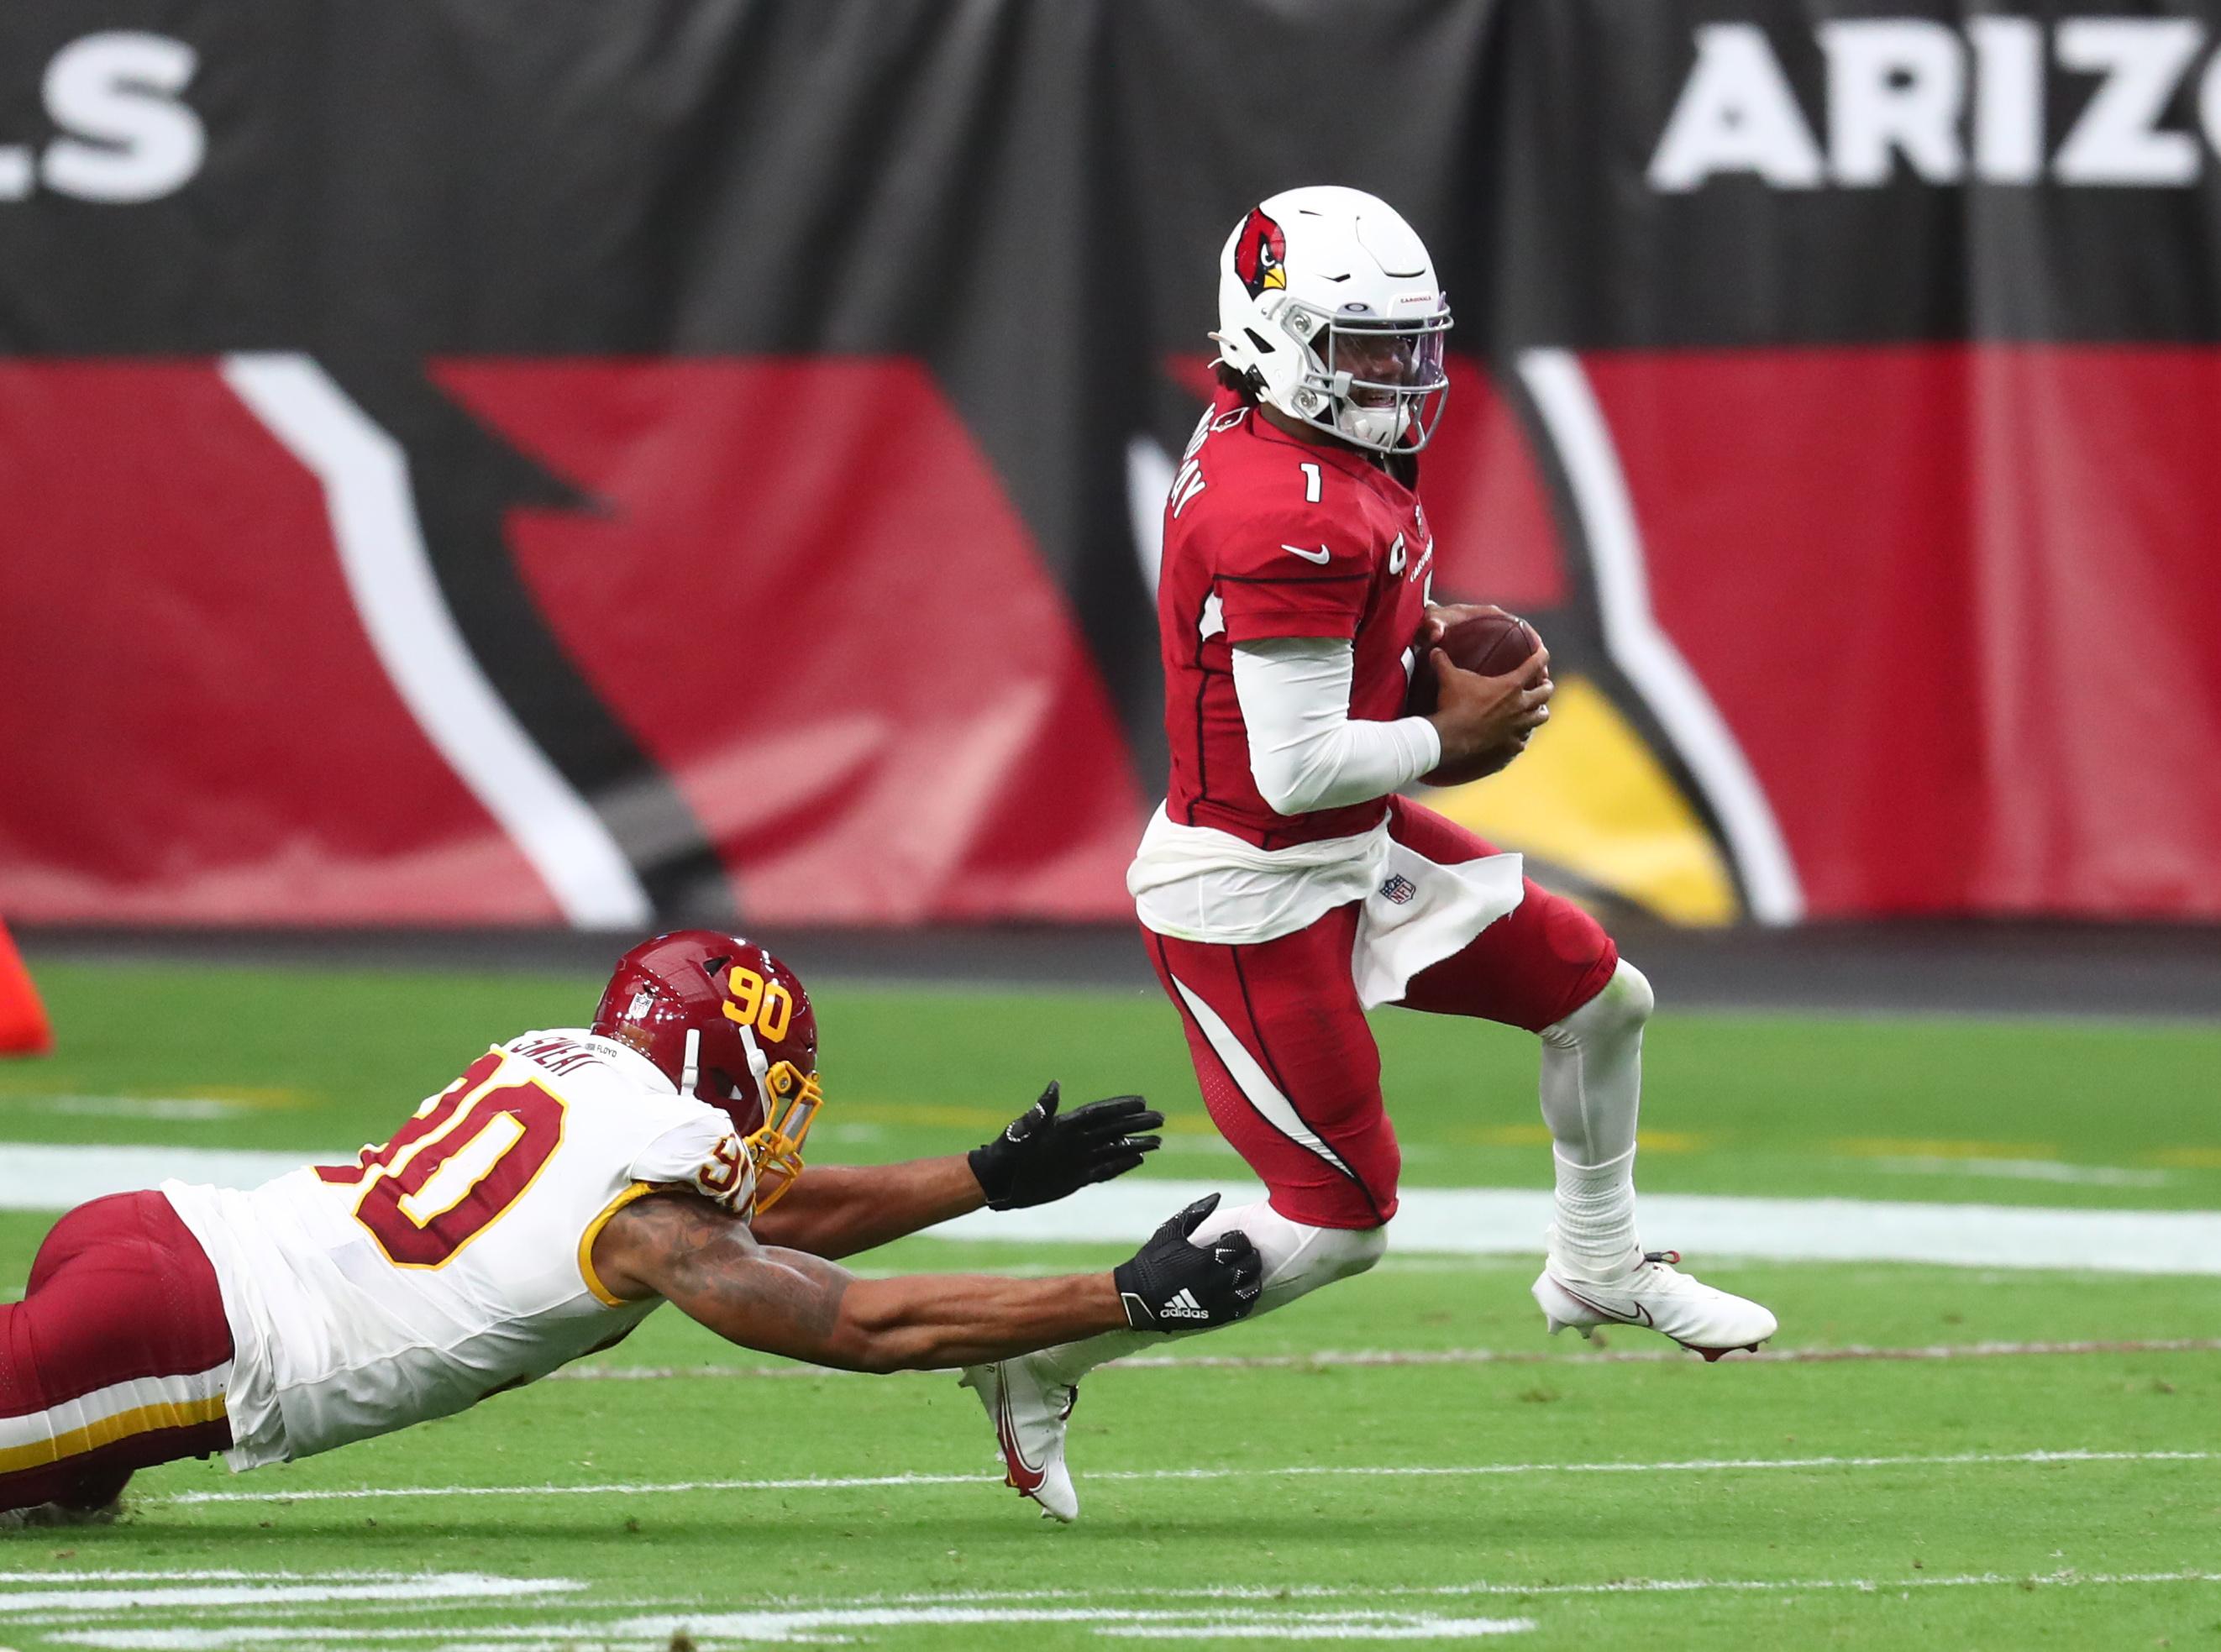 NFL: Washington Football Team at Arizona Cardinals